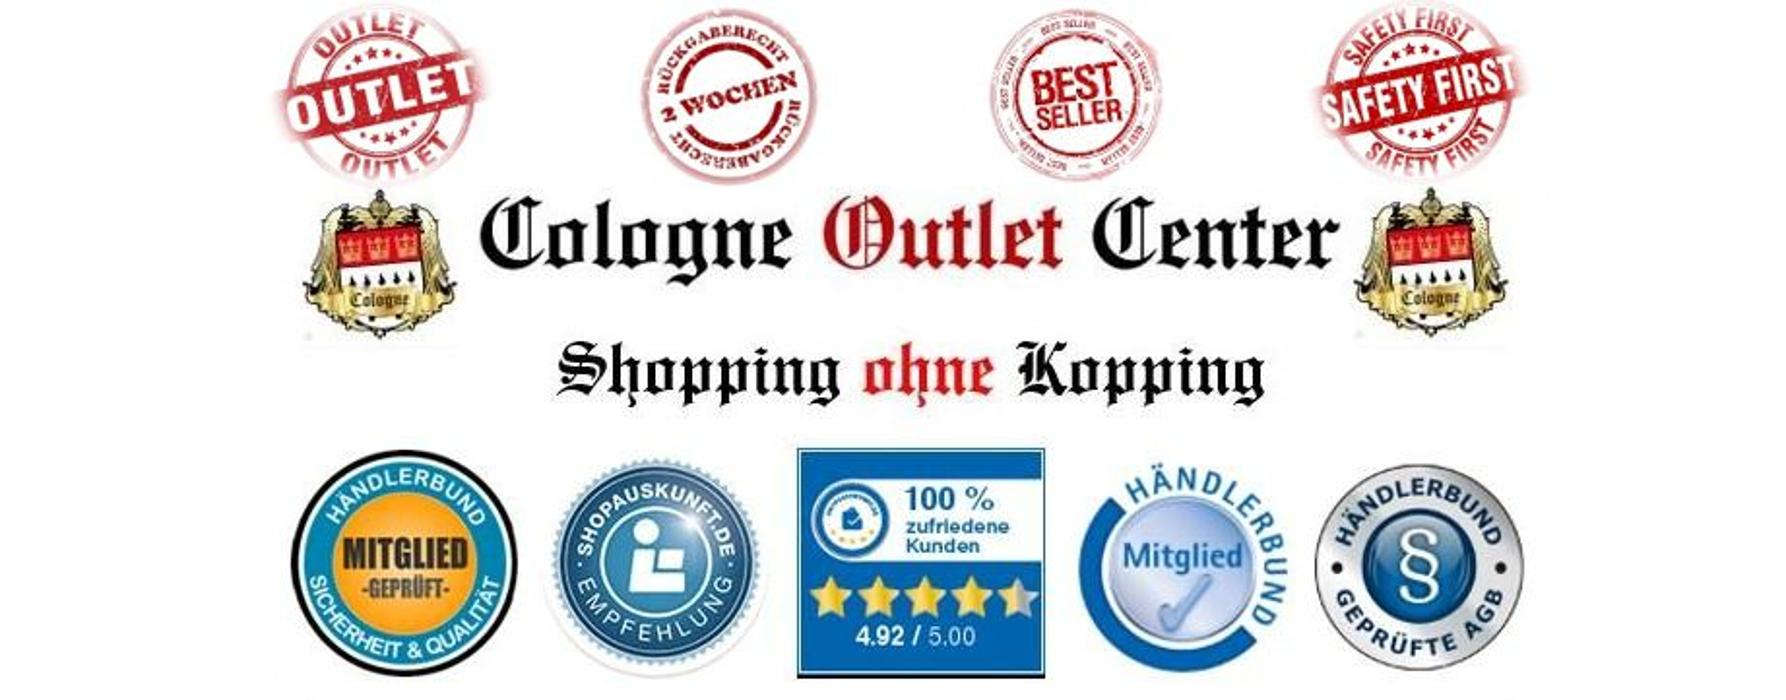 Cologne Outlet Center